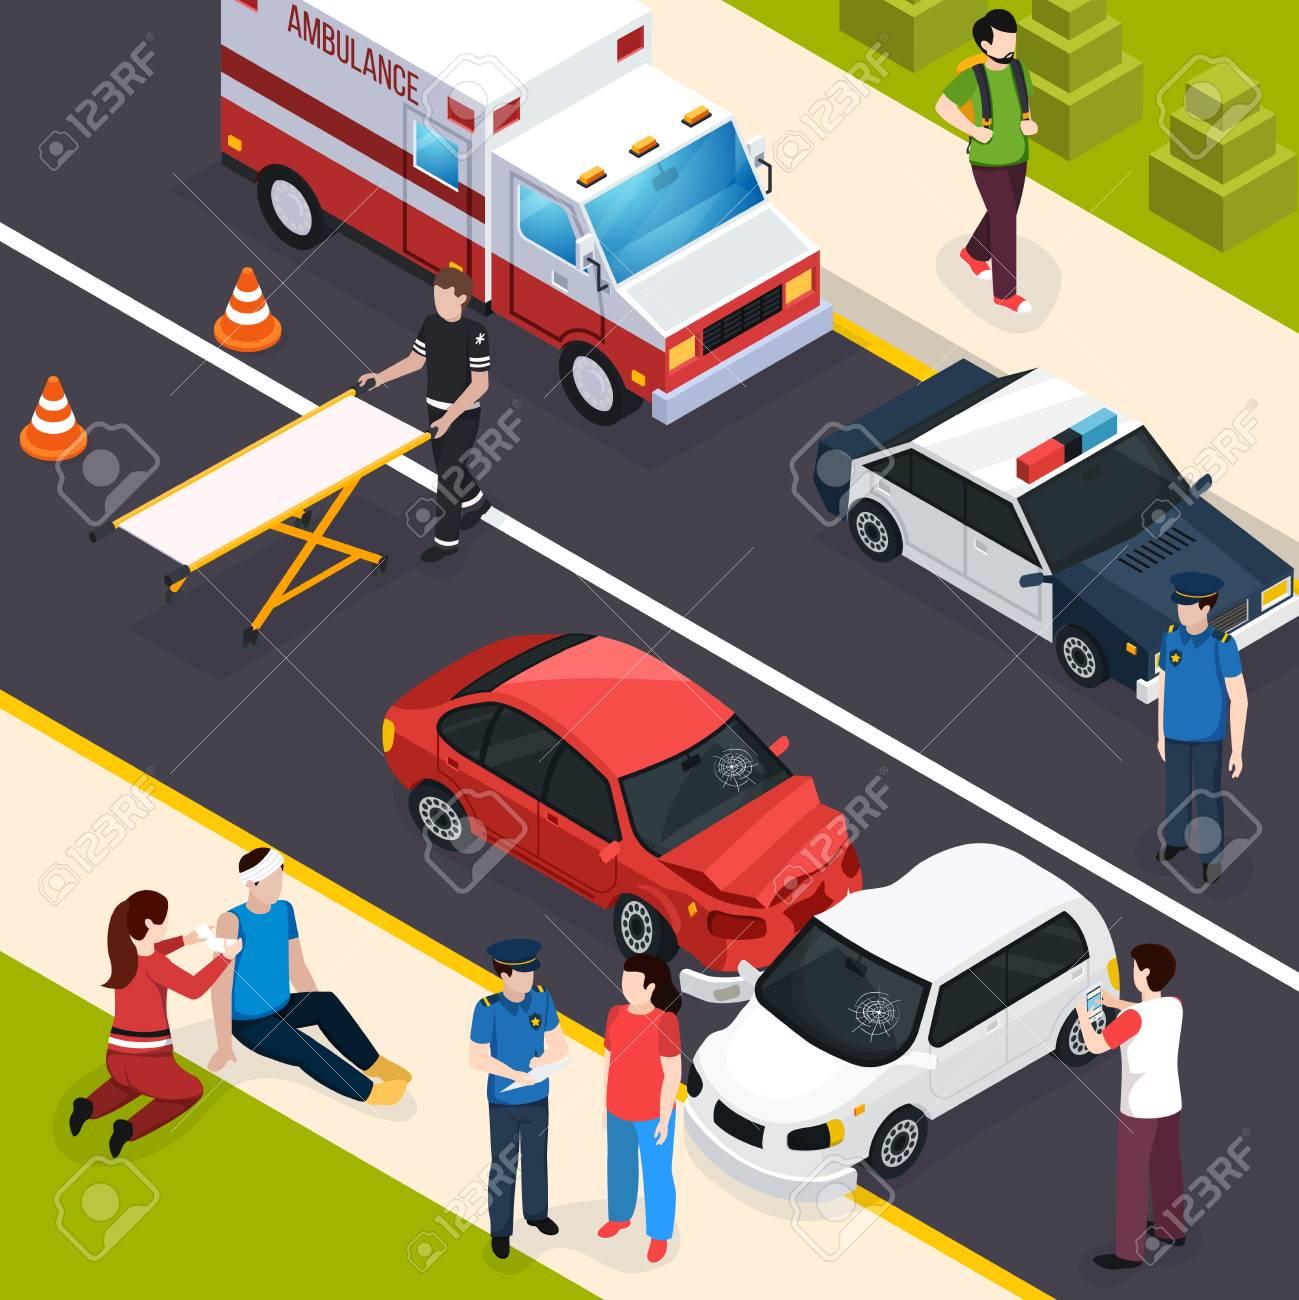 Transparent Car Accident Clipart, HD Png Download , Transparent Png Image -  PNGitem